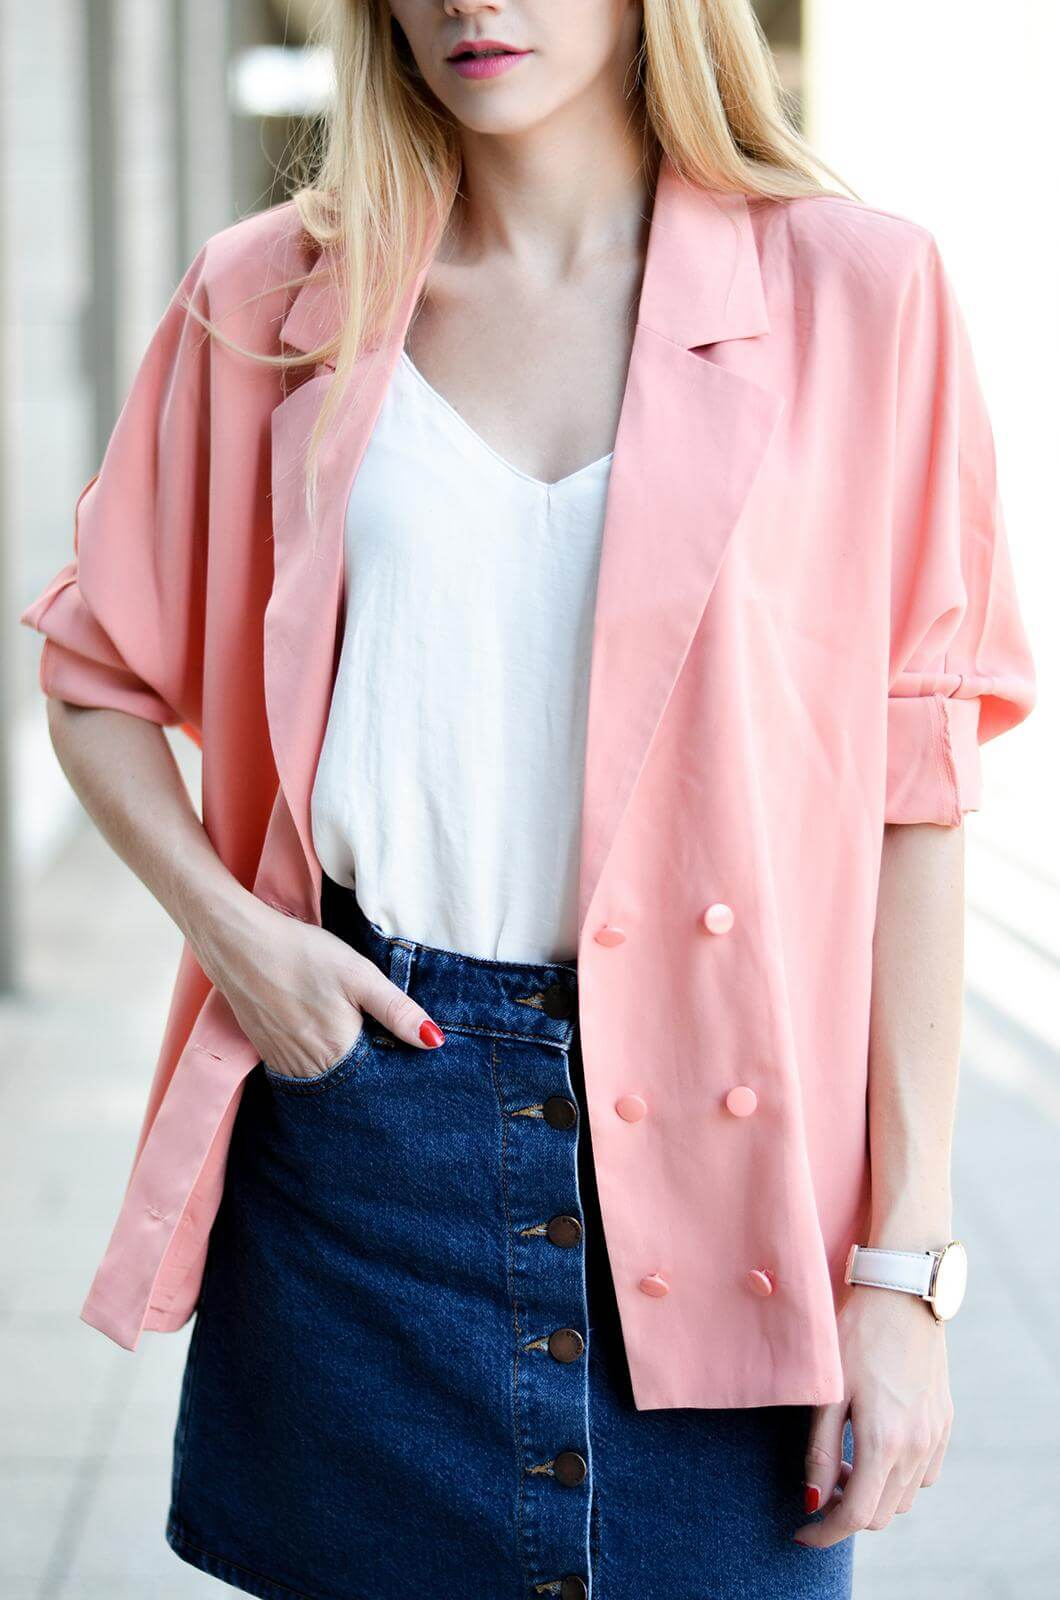 Miu_Miu_outfit_ streetstyle_7